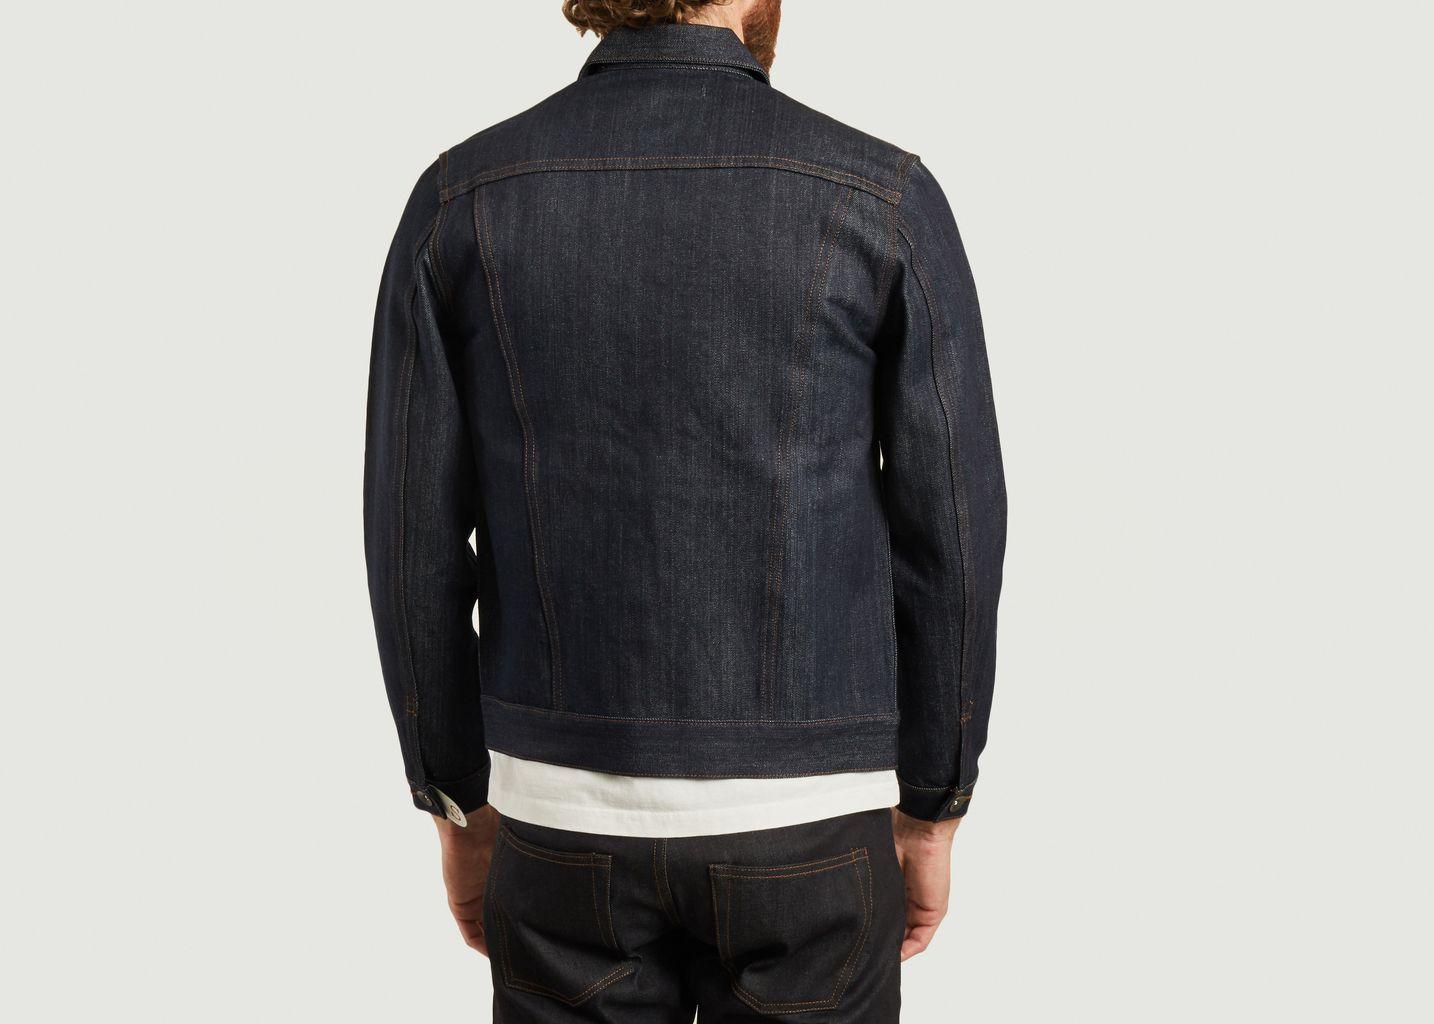 Veste en Jean 14,5 Oz - The Unbranded Brand